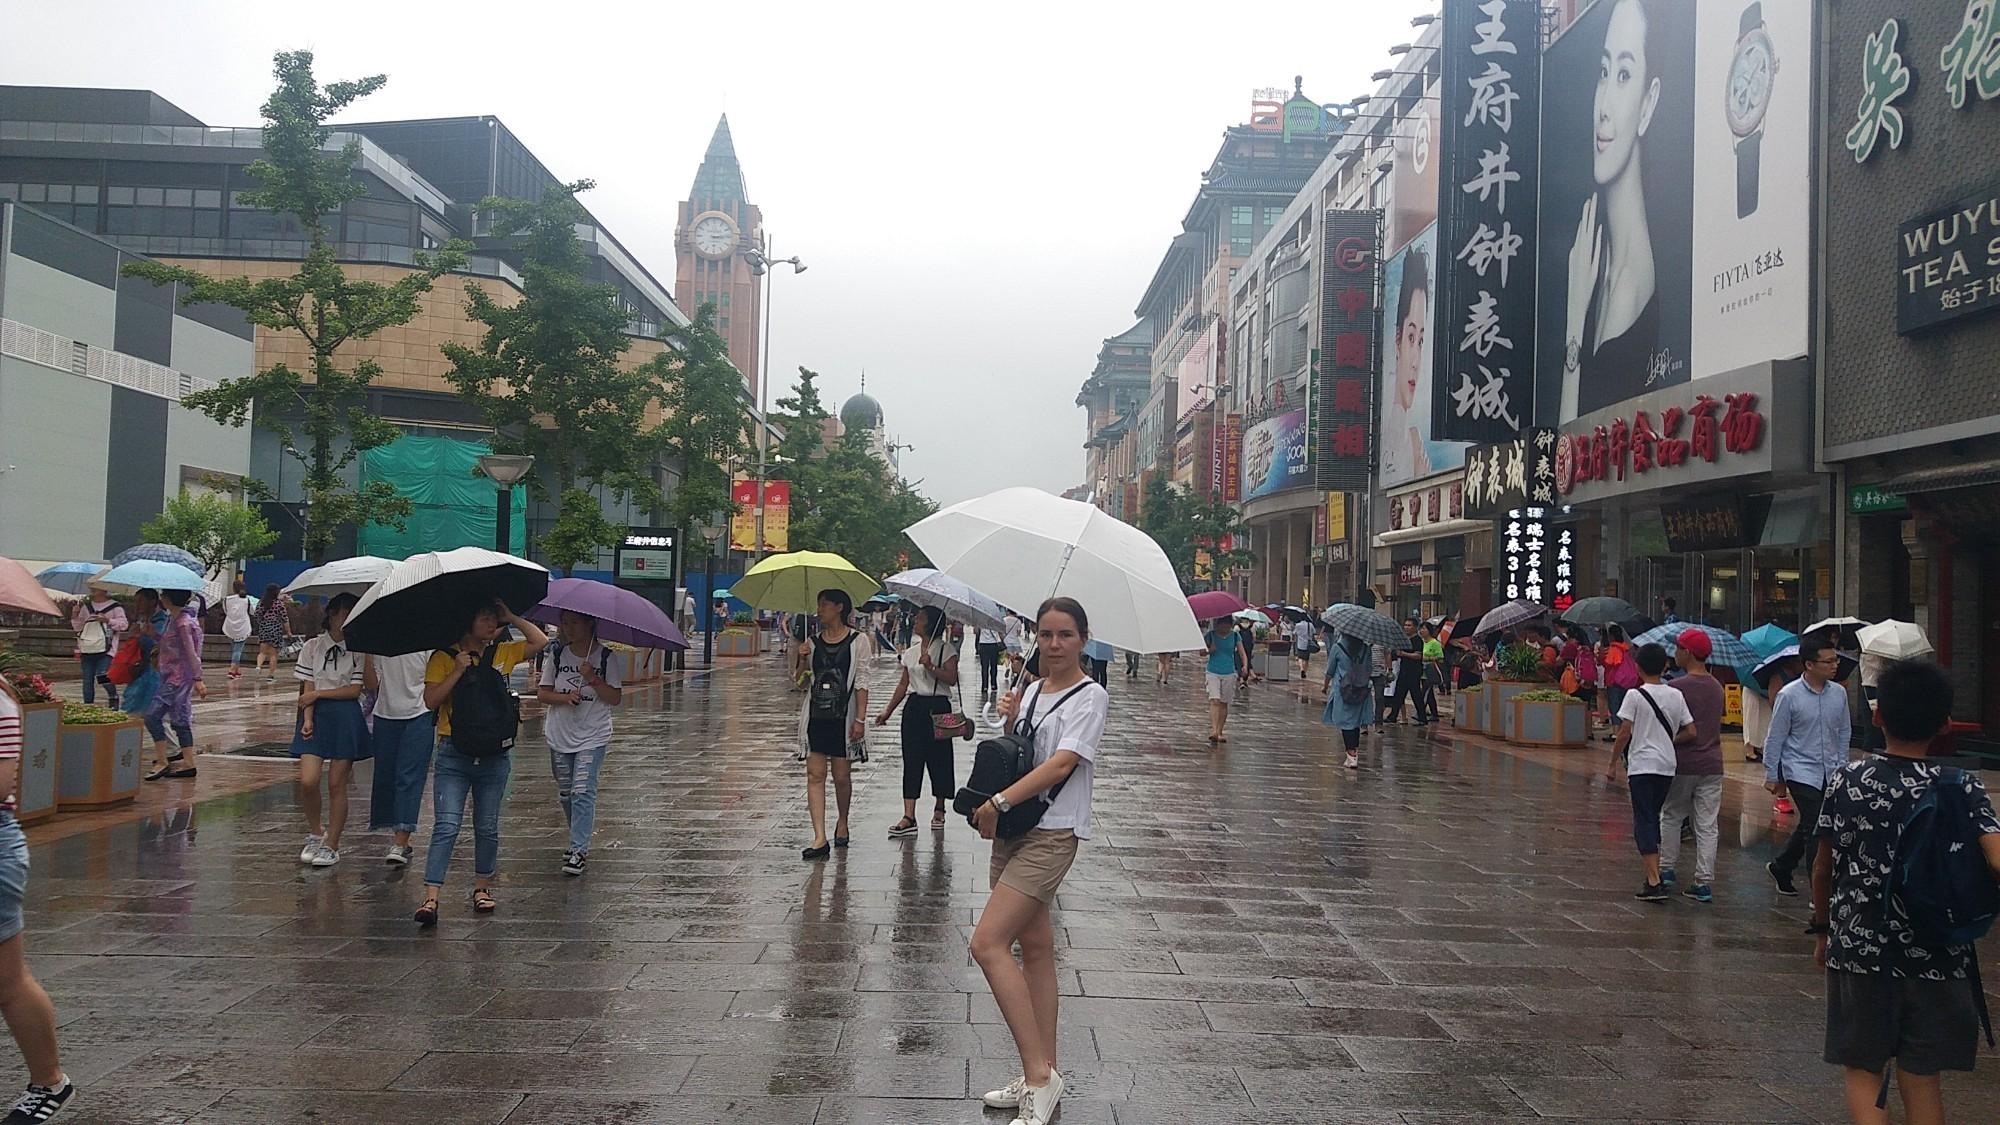 王俯井 — улица Ванфуцзин — одна из самых известных торговых улиц в Пекине.